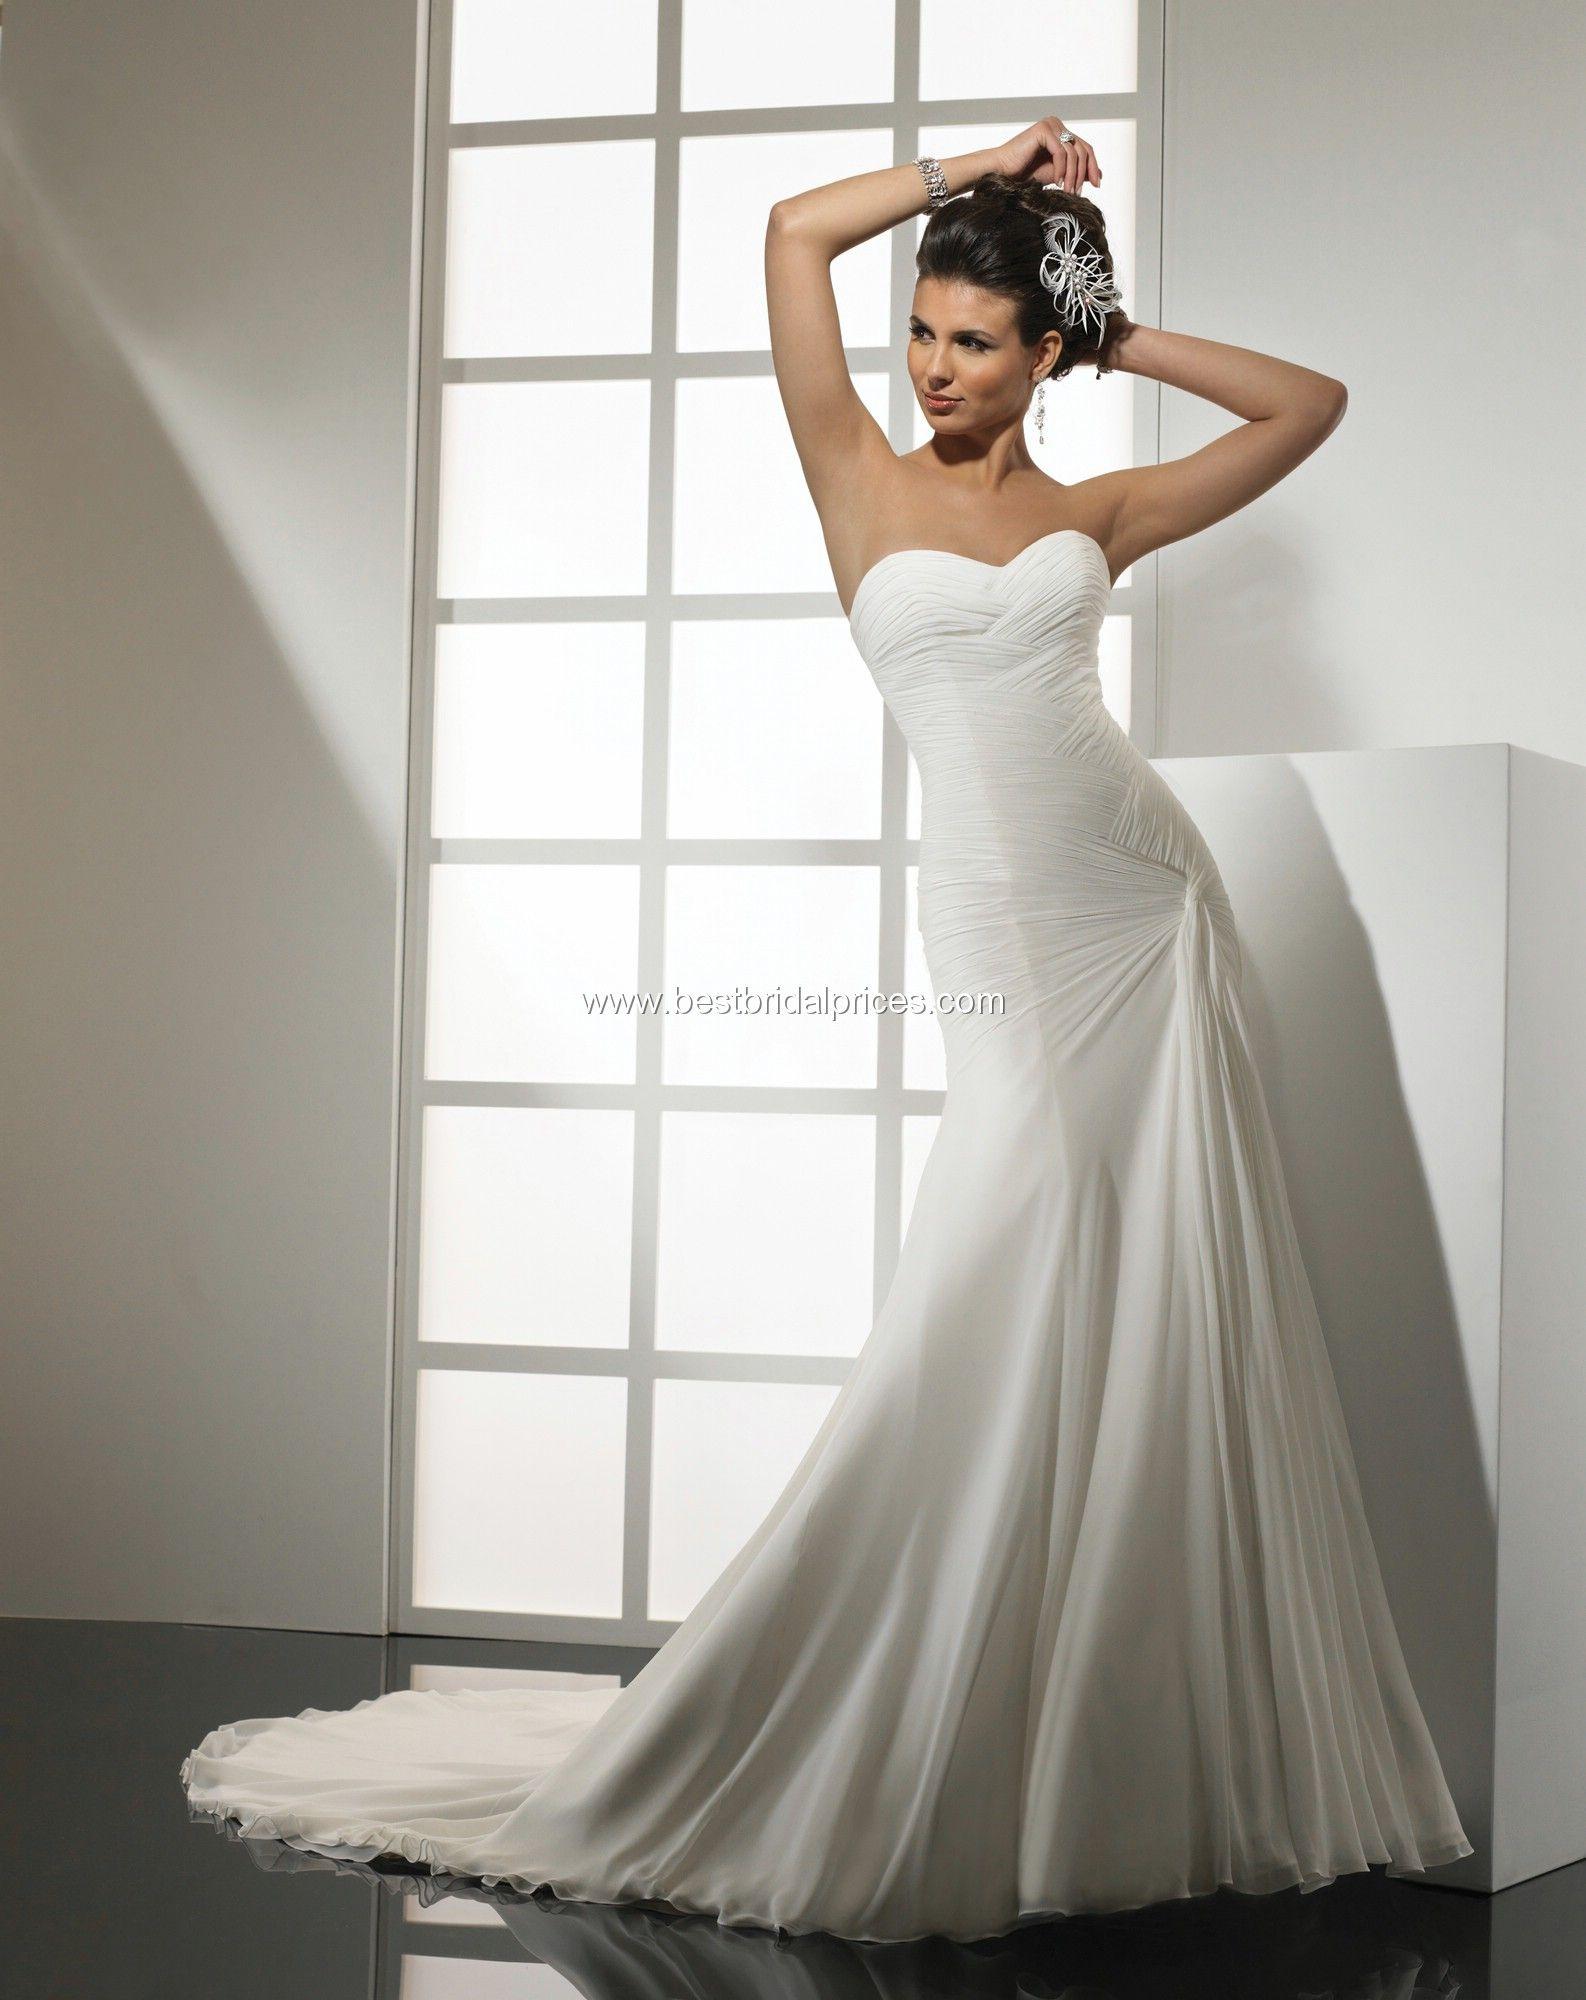 Cute wedding reception dresses for the bride  Sottero u Midgley Claricerfect beach dress  Wedding Ideas